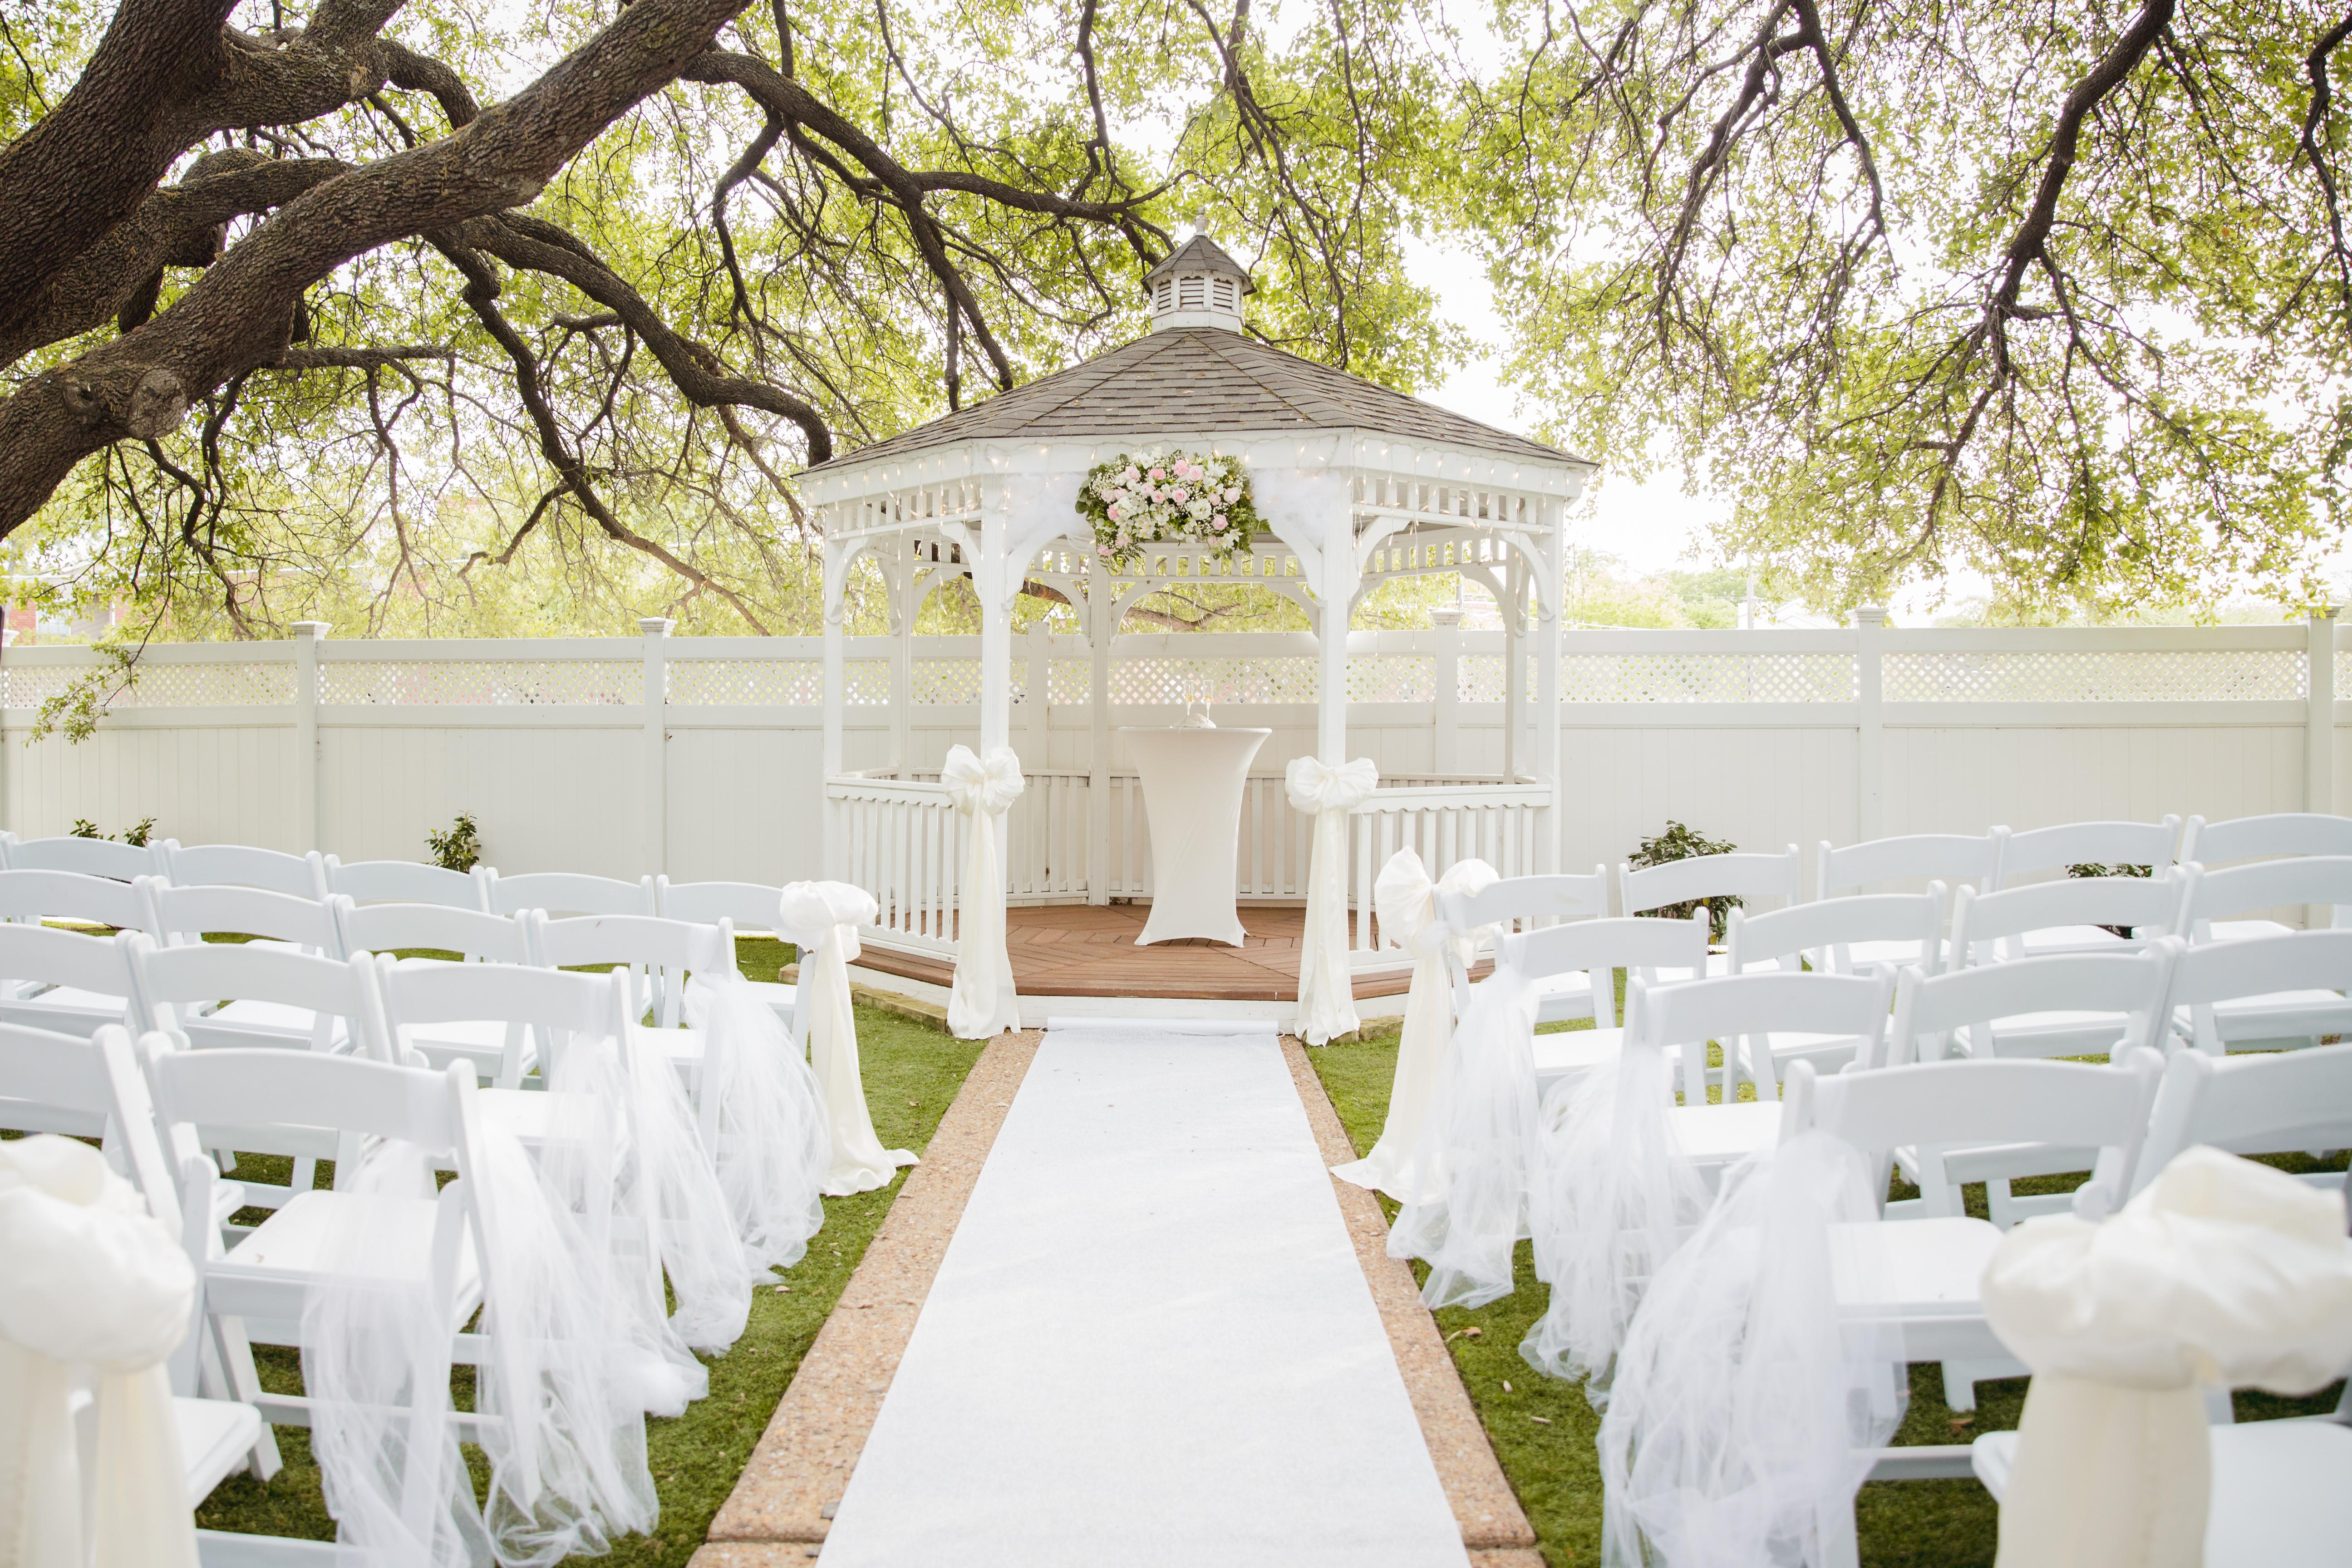 POP Wedding – A Practical Wedding Option